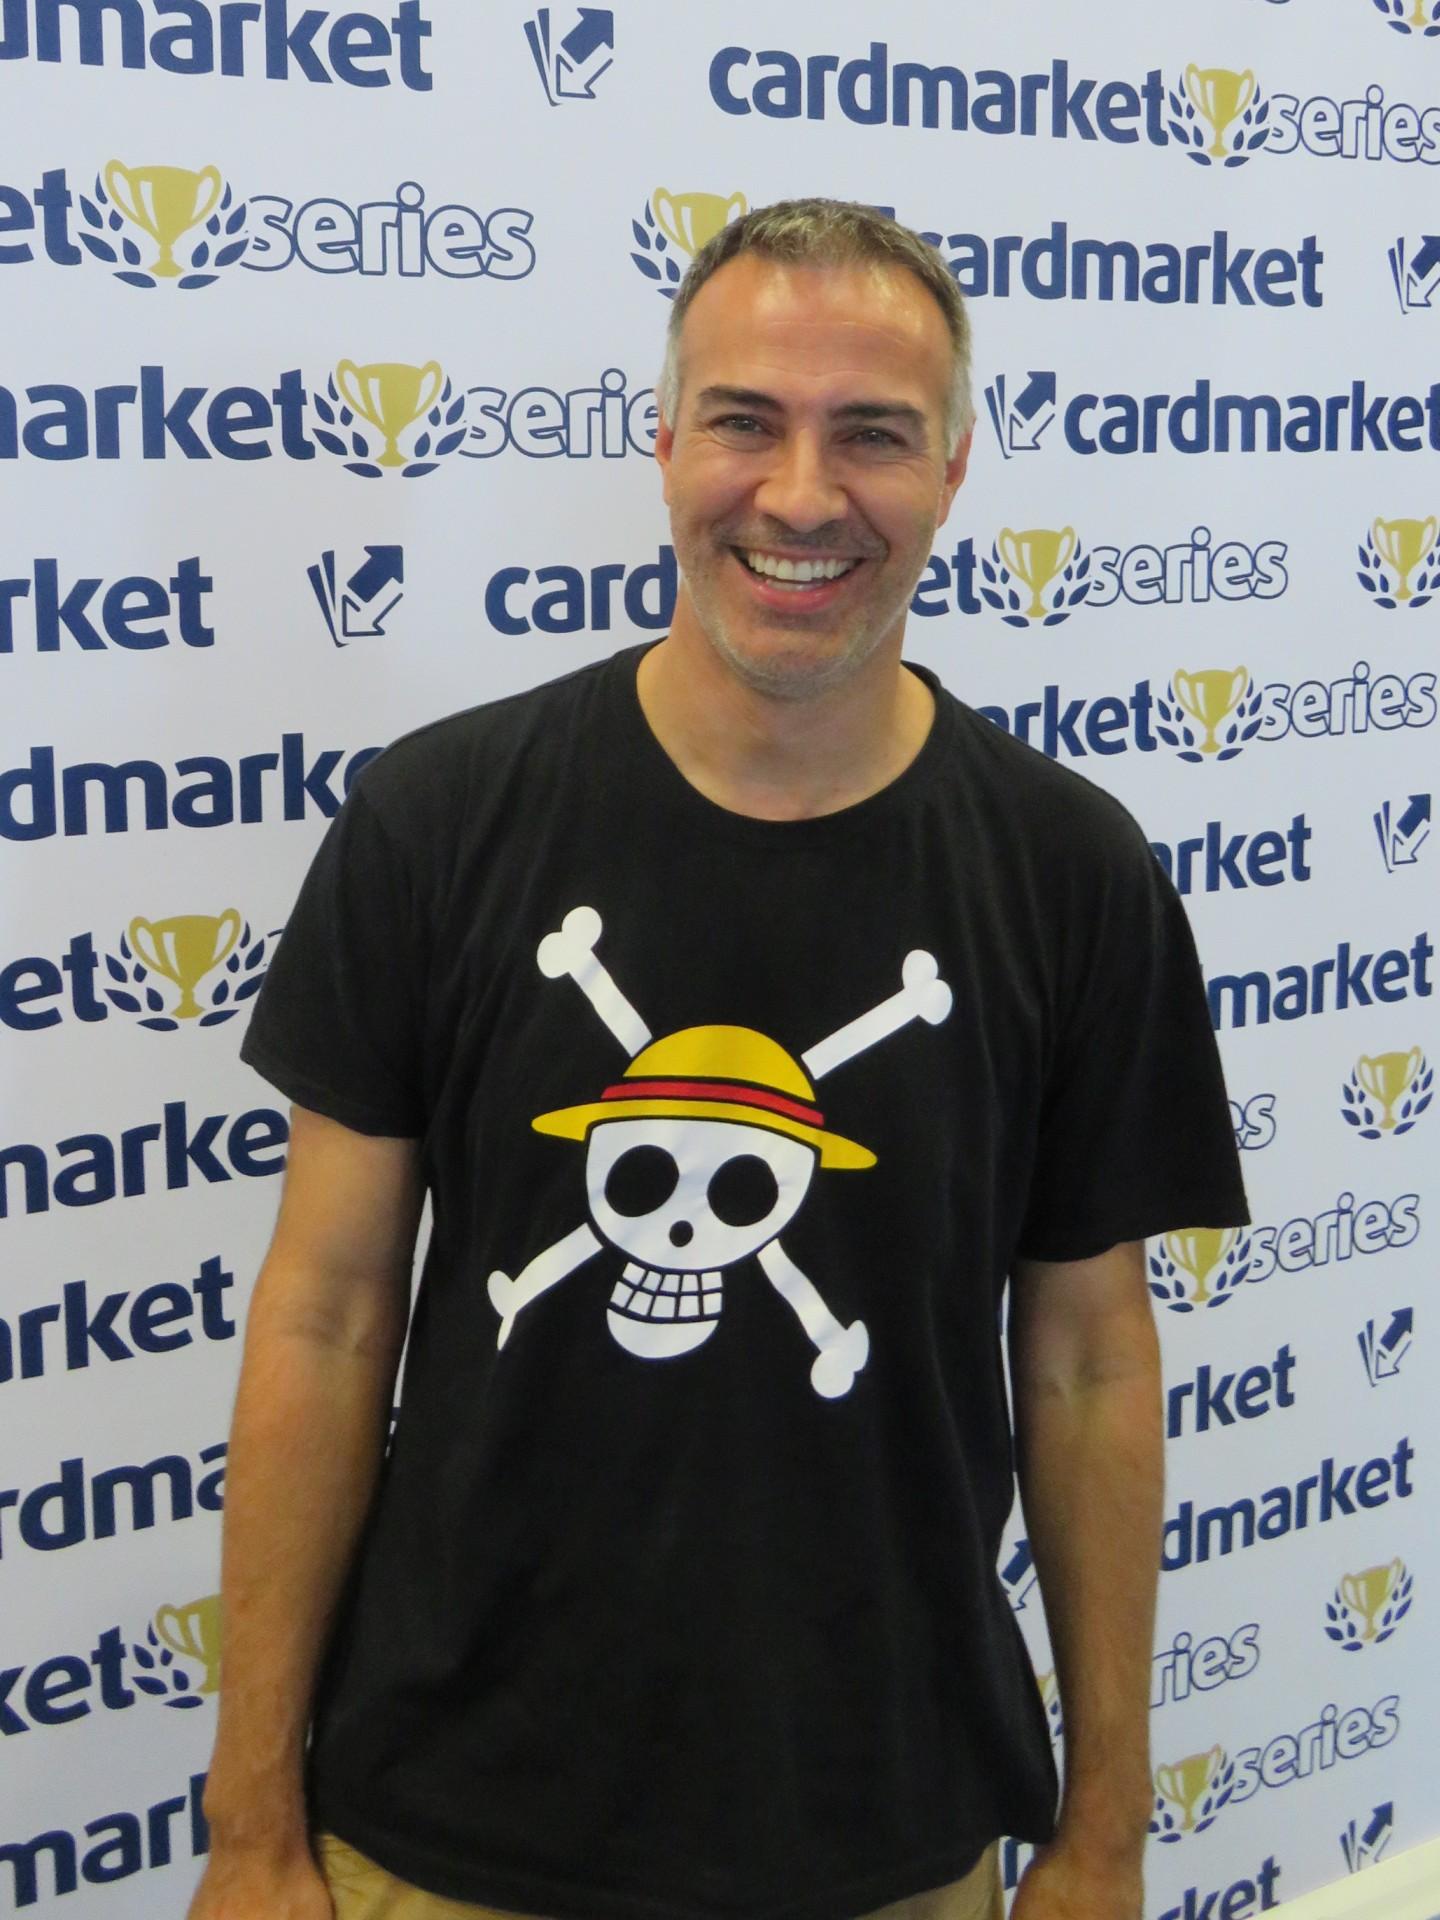 Martin Tono Viudez